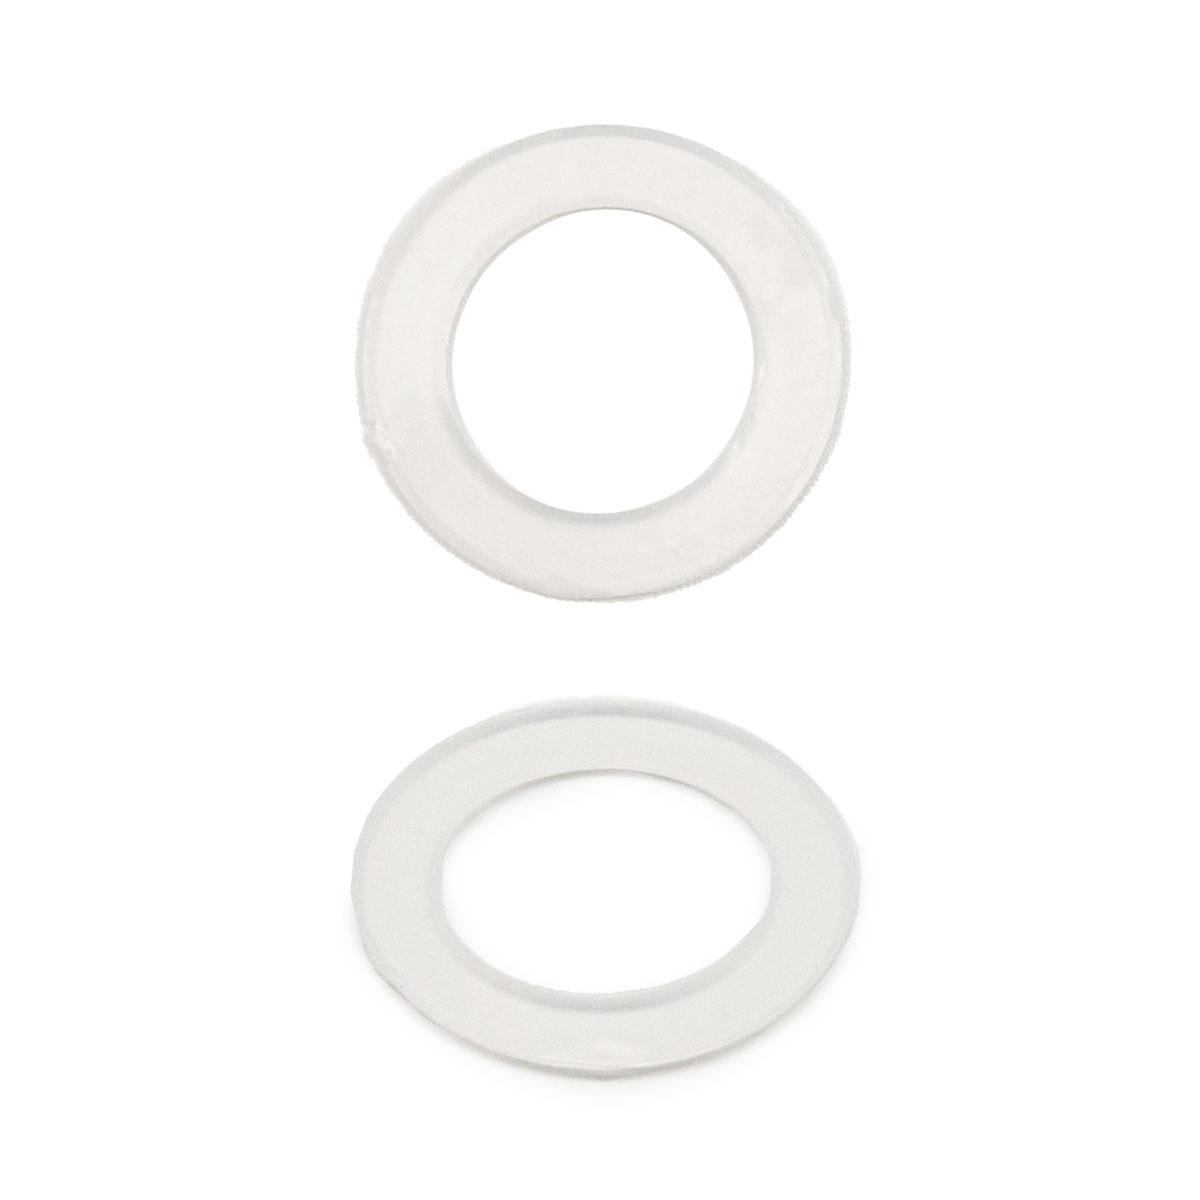 64780 Кольцо пласт. под люверс, д-14,5мм, прозр. ГР